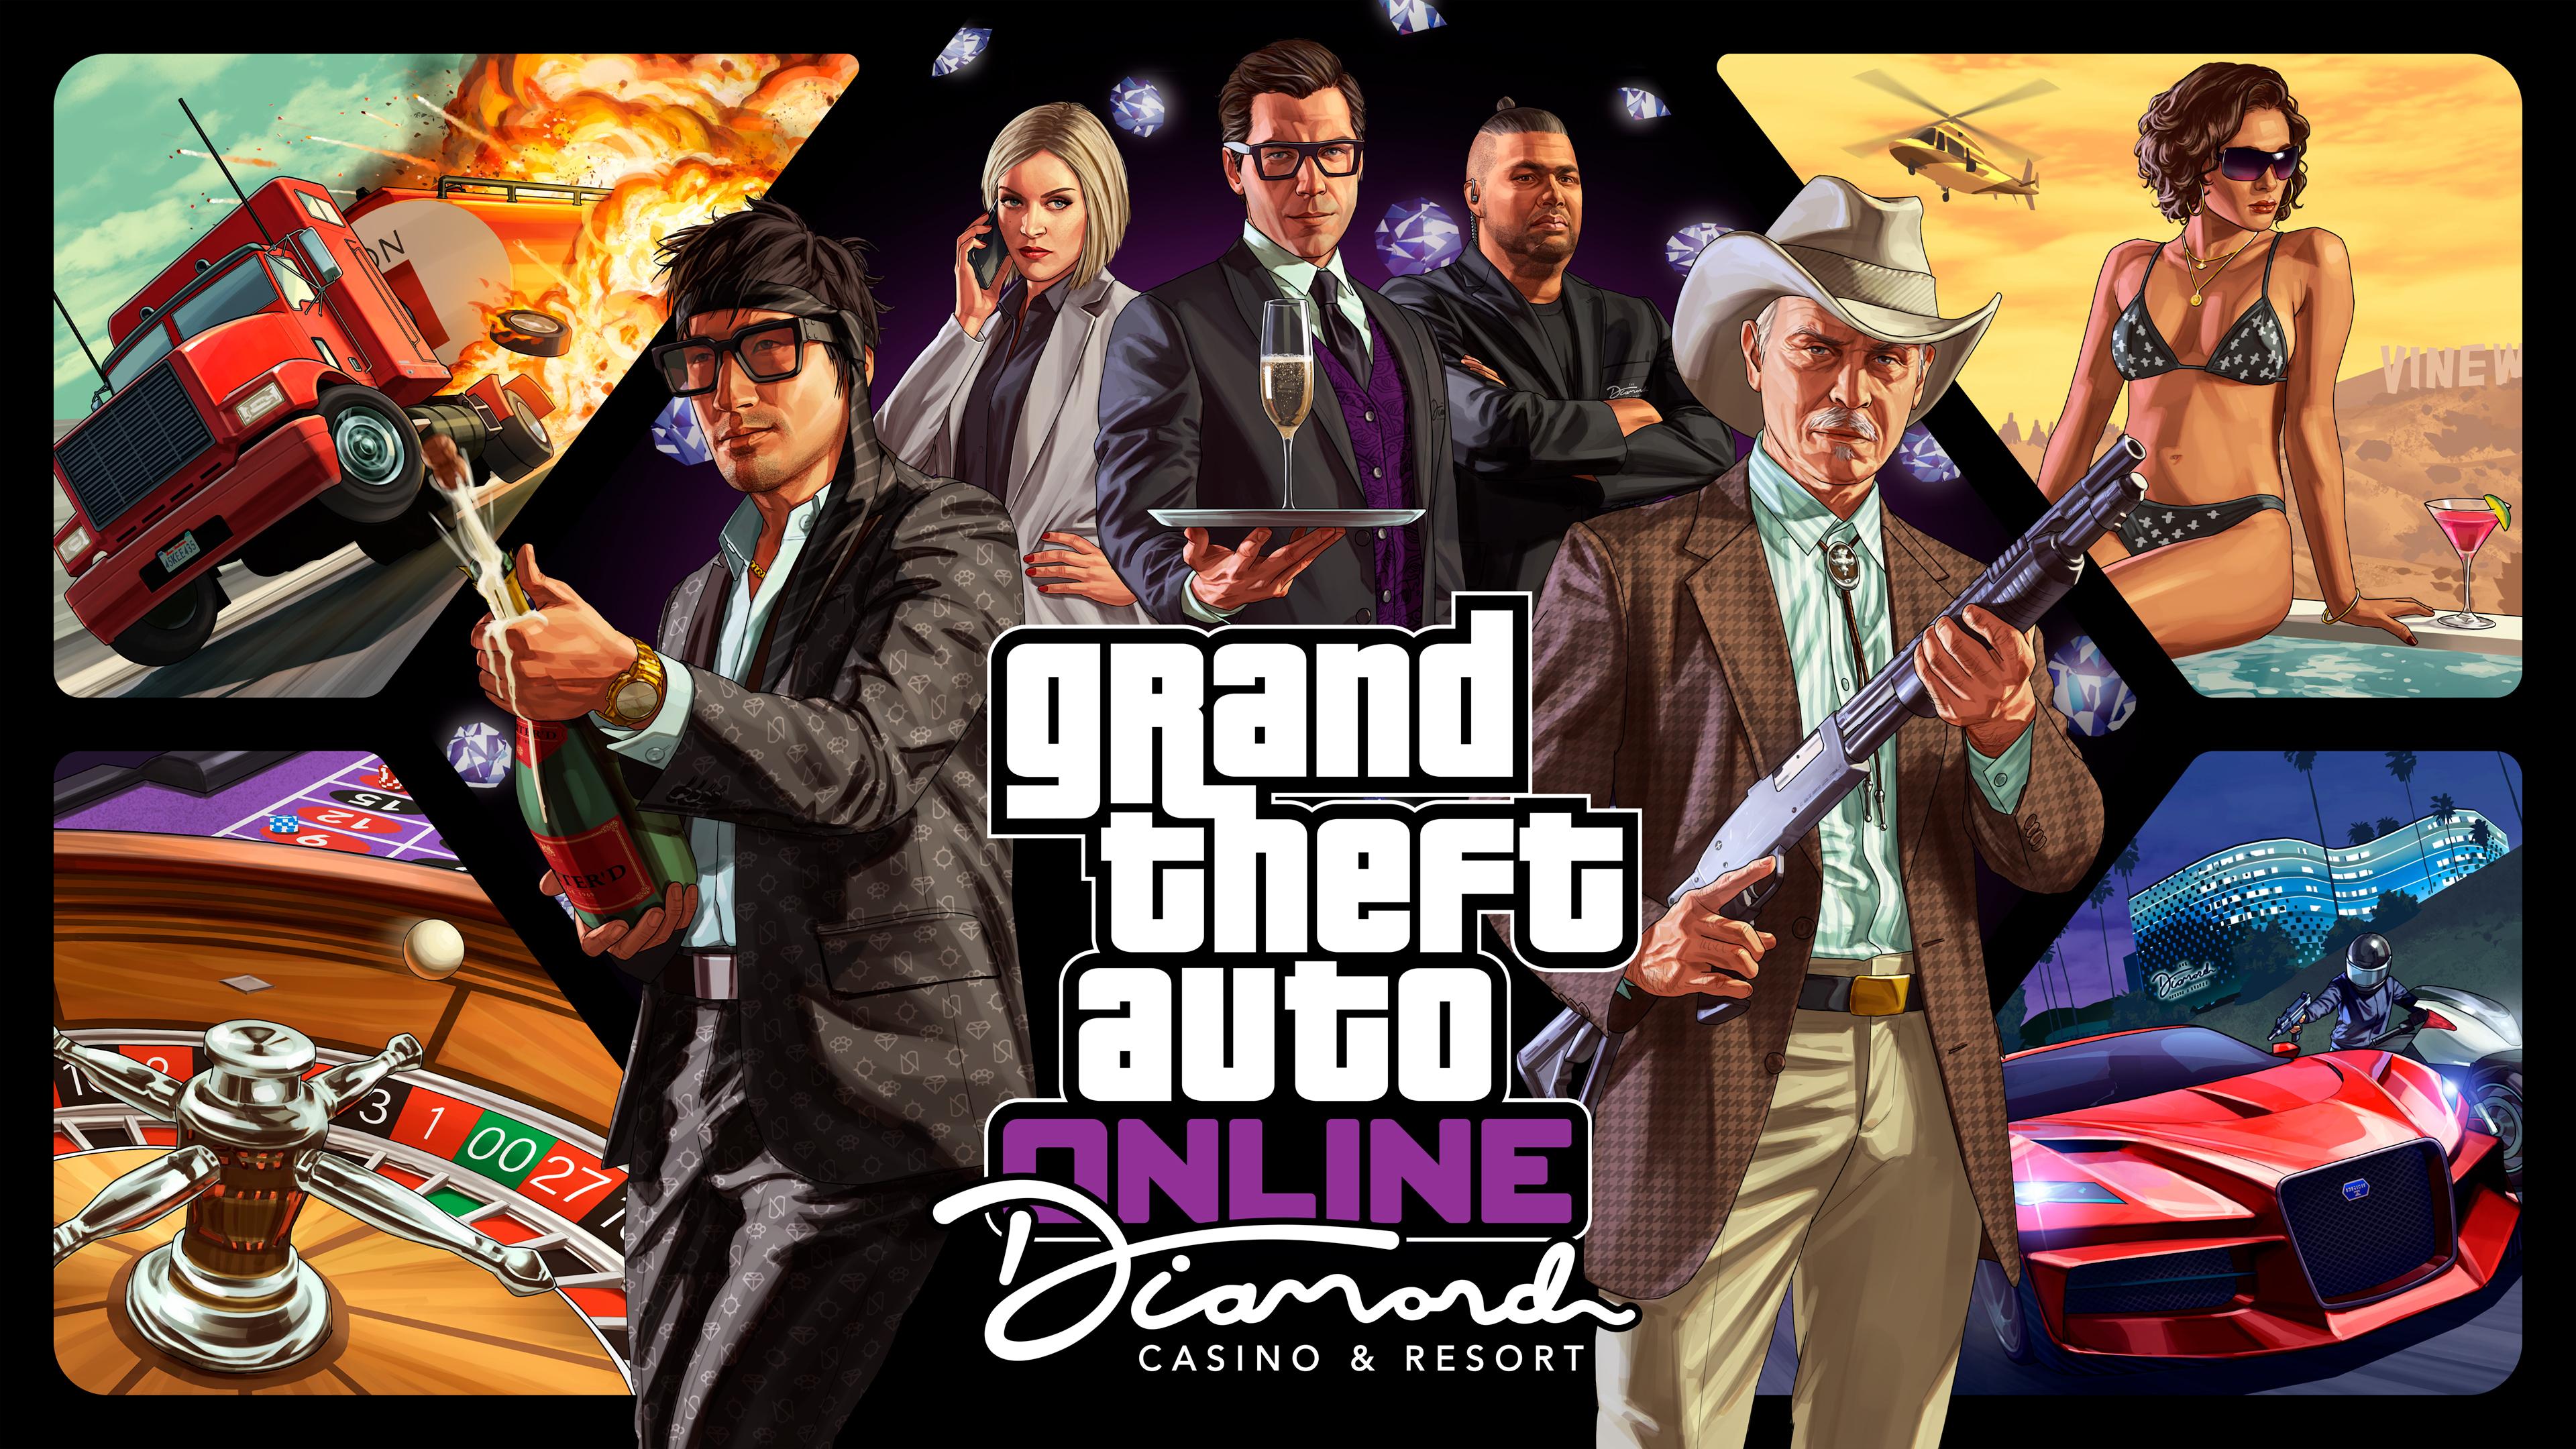 The Diamond Casino Resort Gta Wiki Fandom